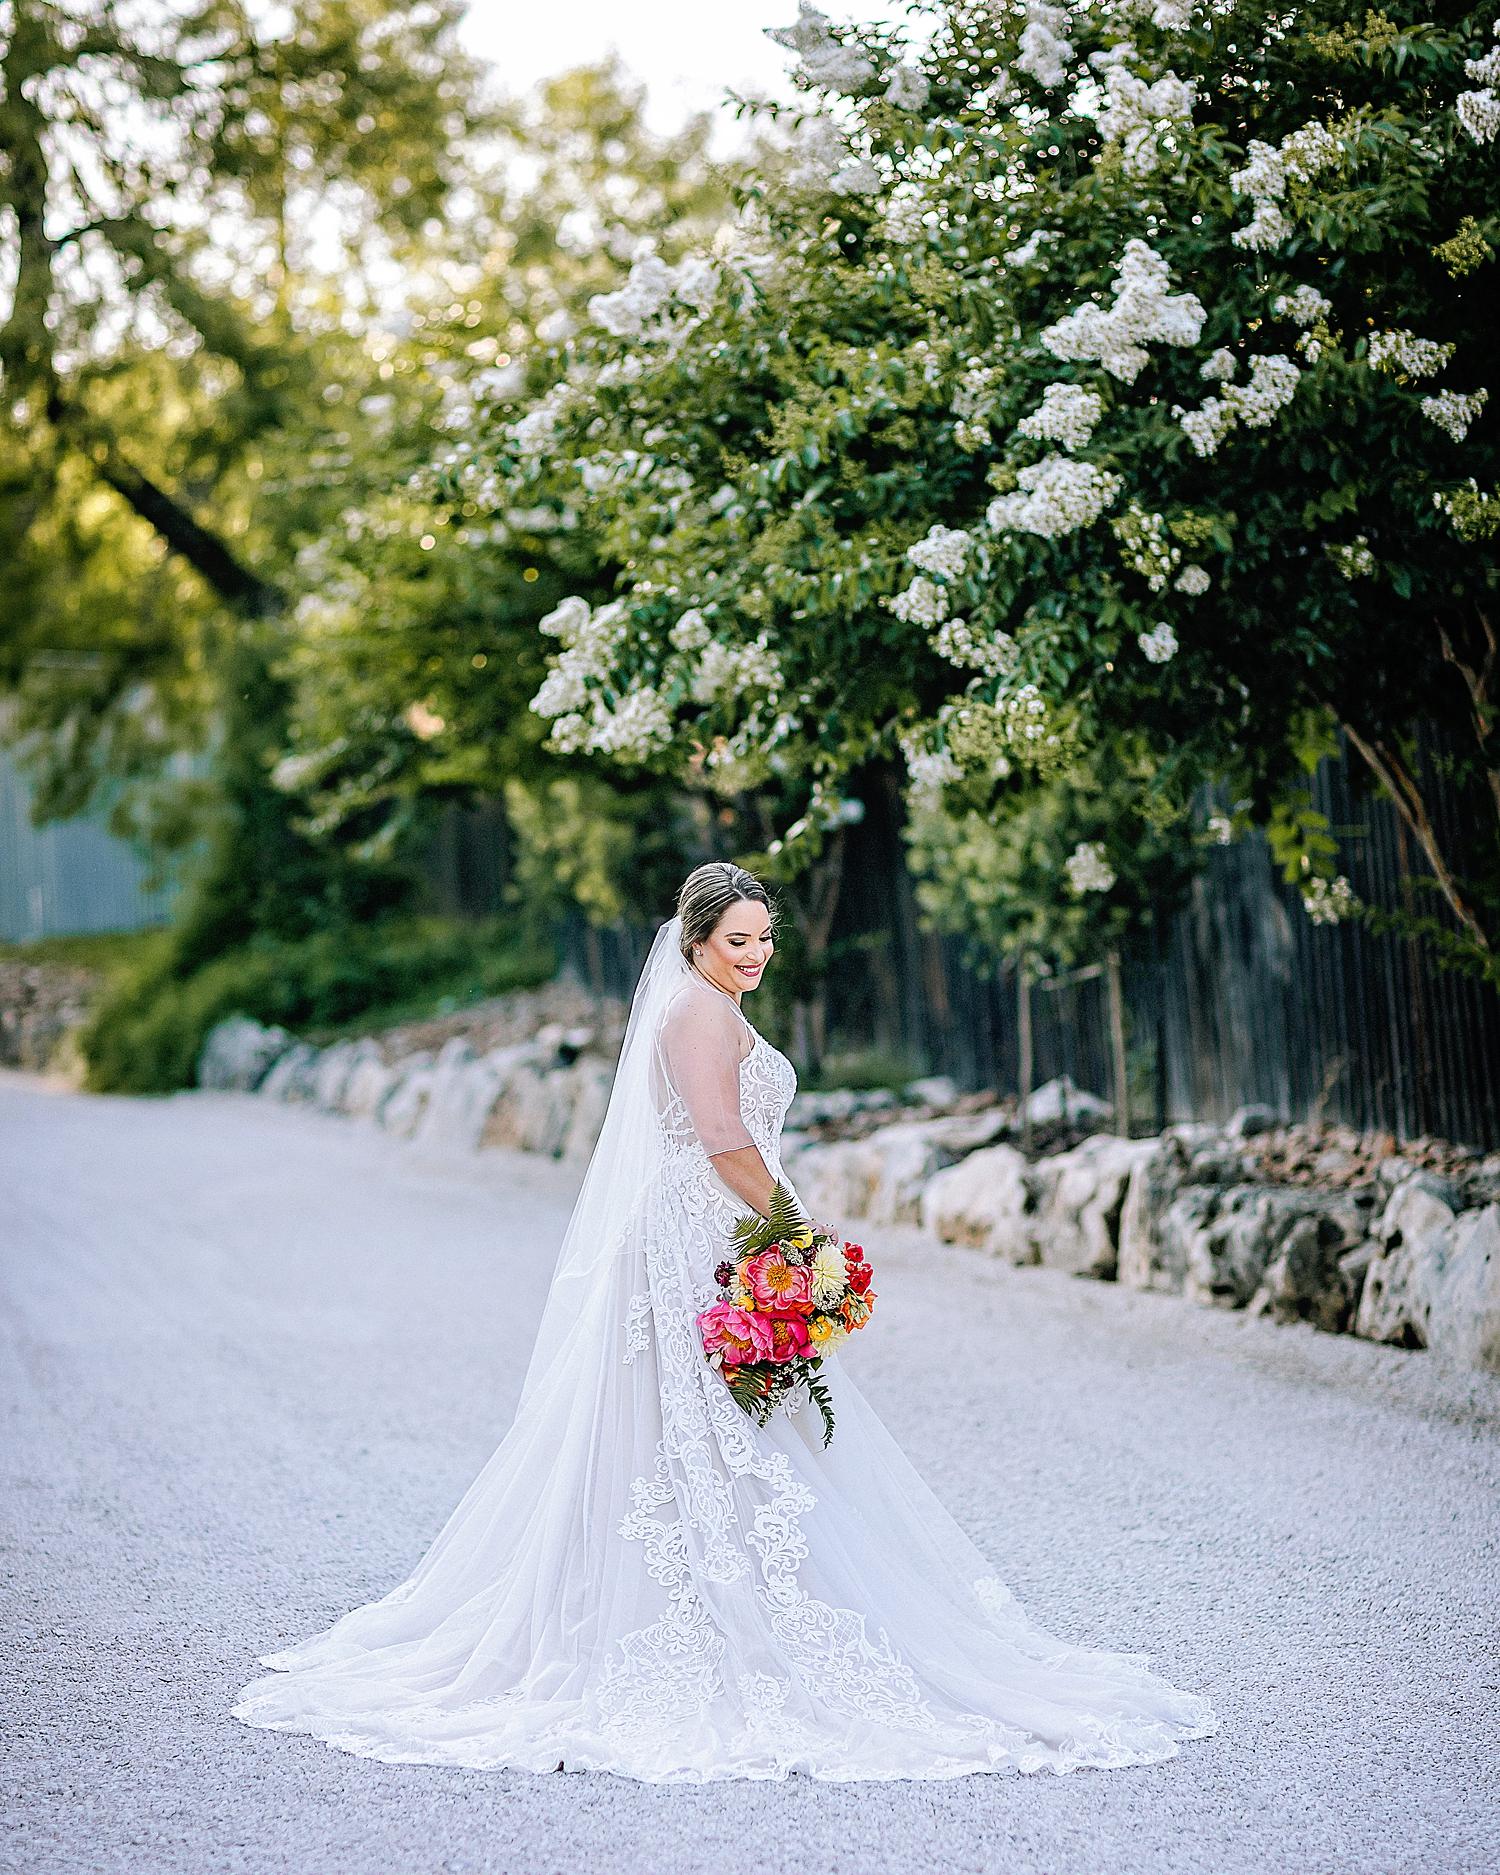 Gruene-Estate-Wedding-New-Braunfels-Bride-Bridal-Photos-Carly-Barton-Photography_0028.jpg